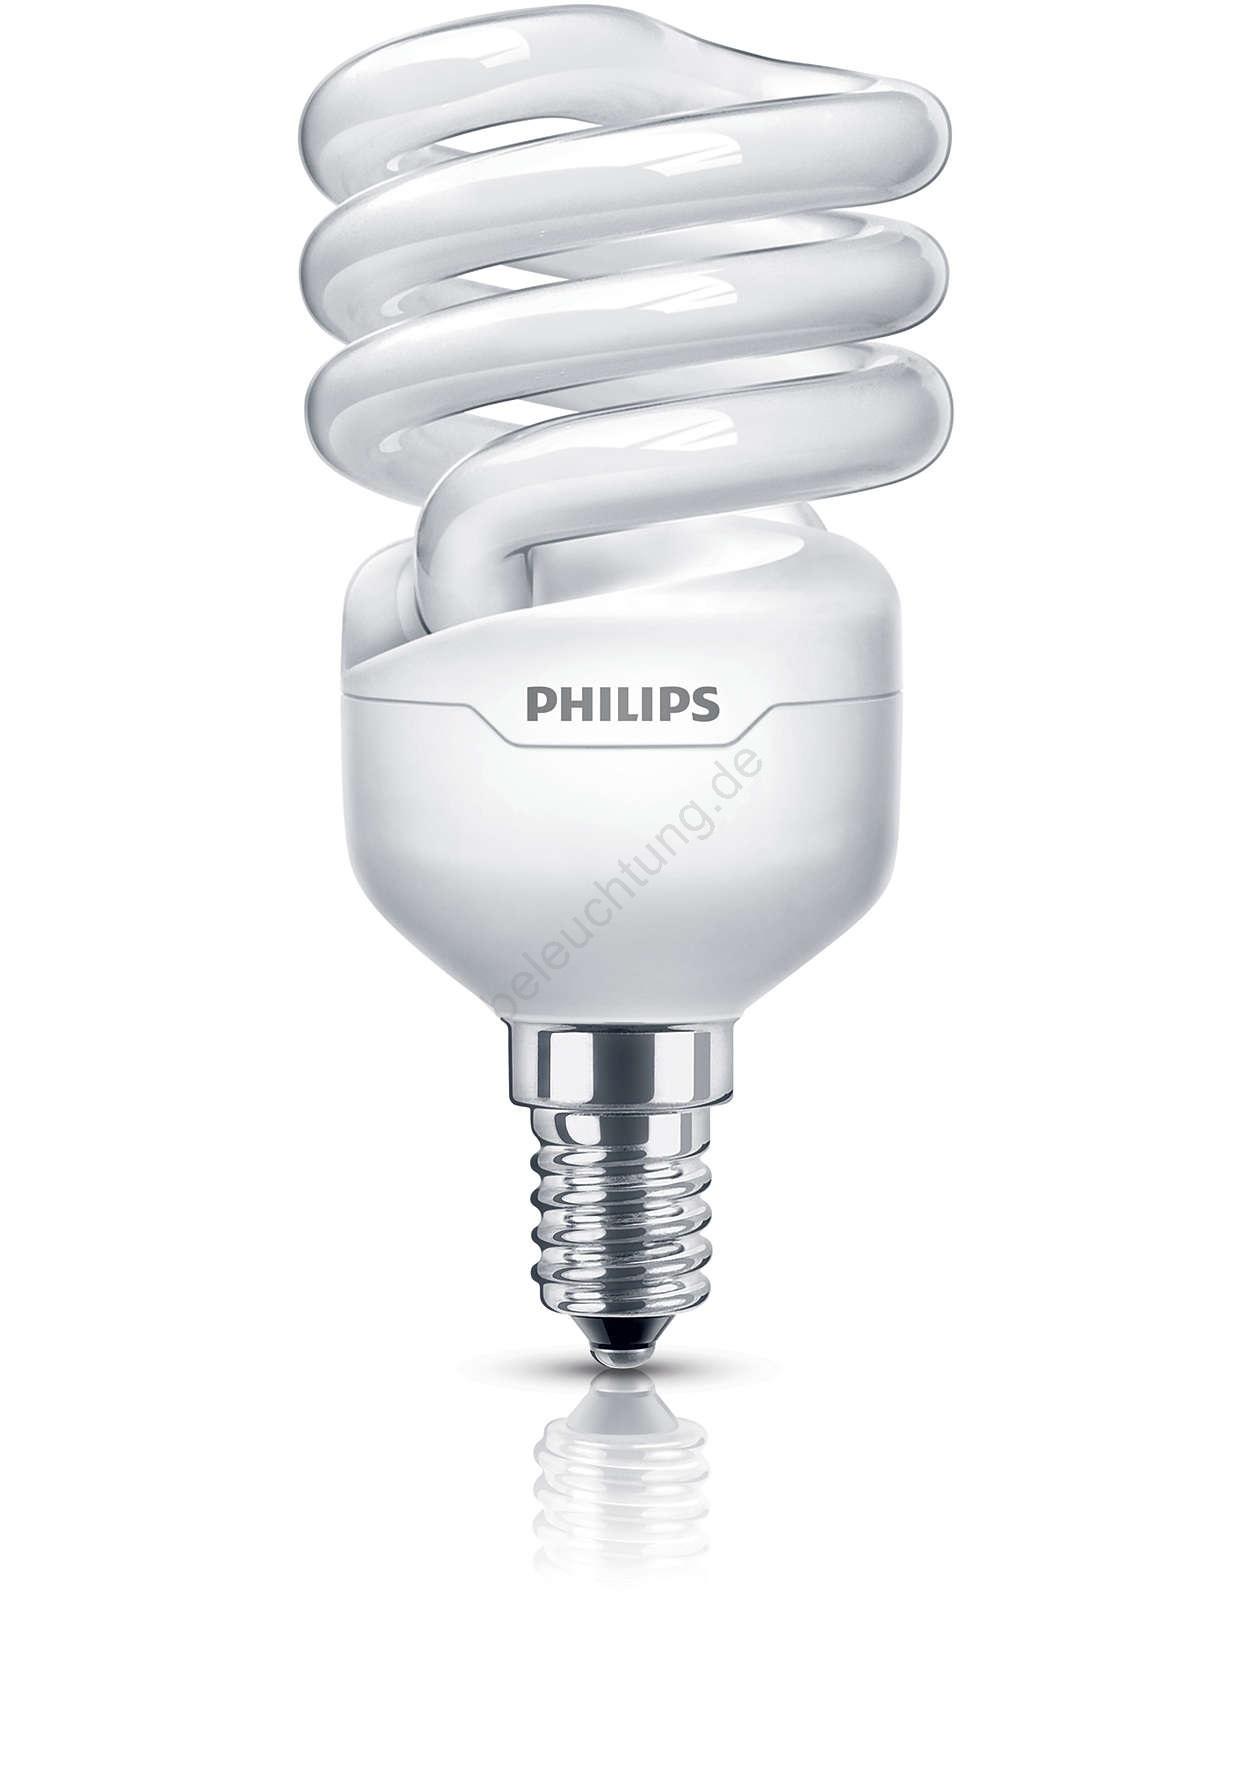 energiesparlampe philips e14 12w 230v tornado beleuchtung. Black Bedroom Furniture Sets. Home Design Ideas